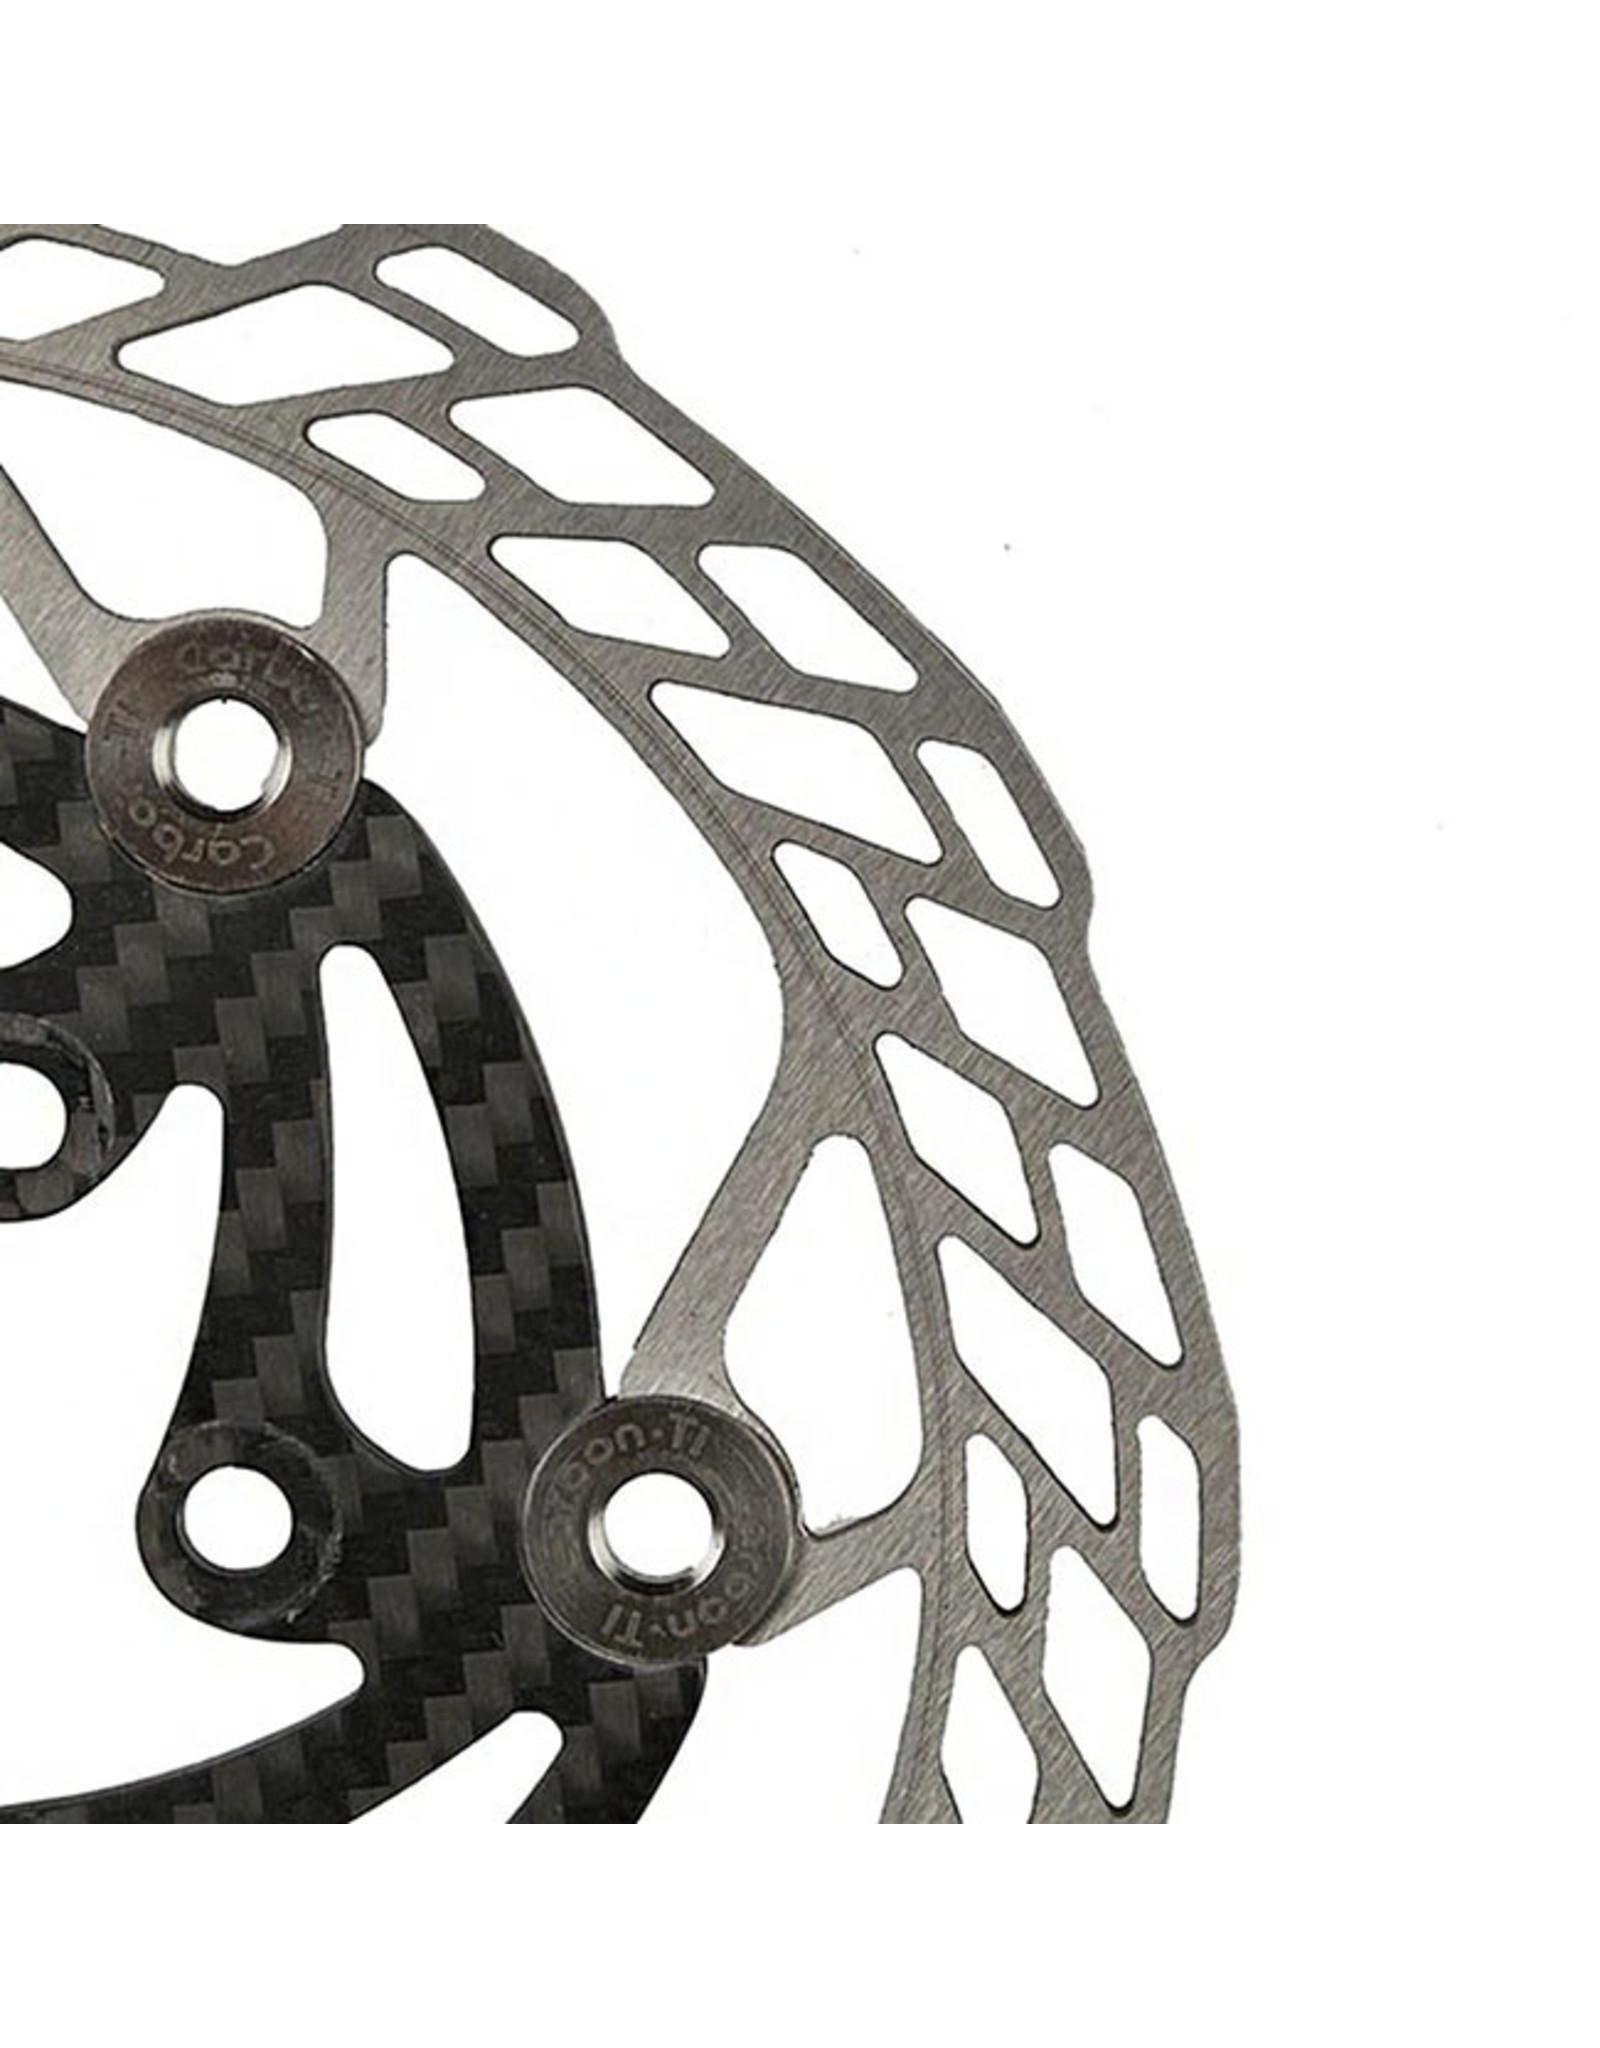 Carbon-Ti Carbon-Ti X-Rotor SteelCarbon 2